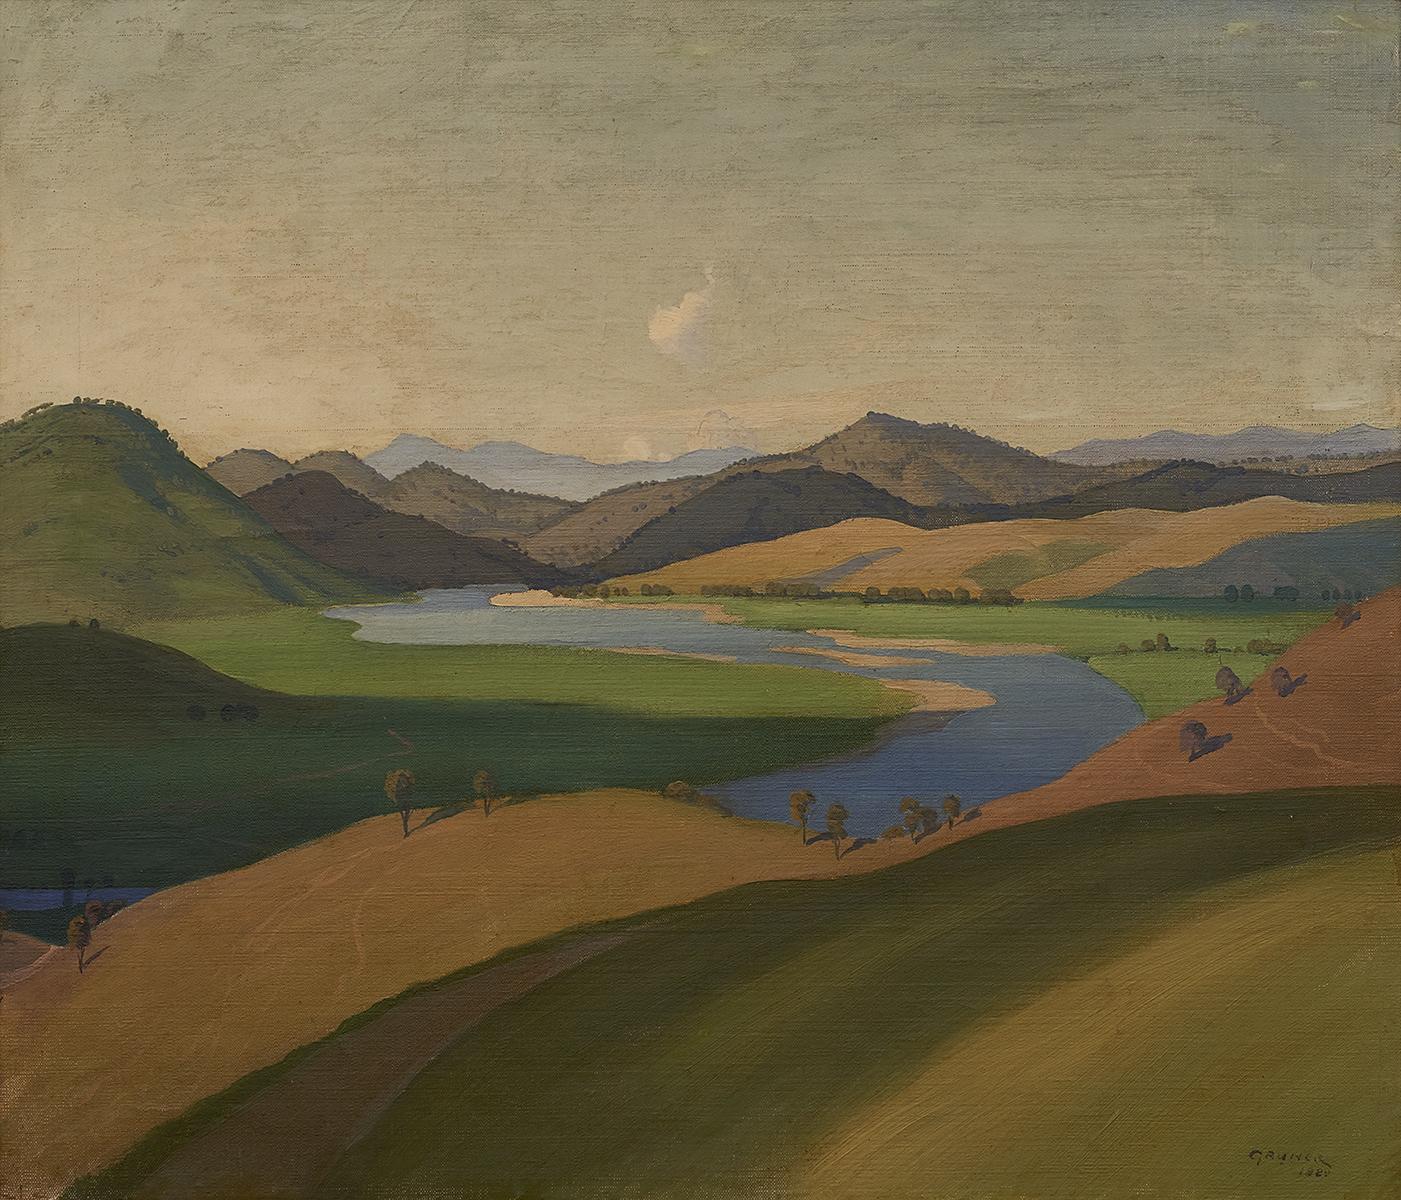 Elioth Gruner <br>(1882-1939)